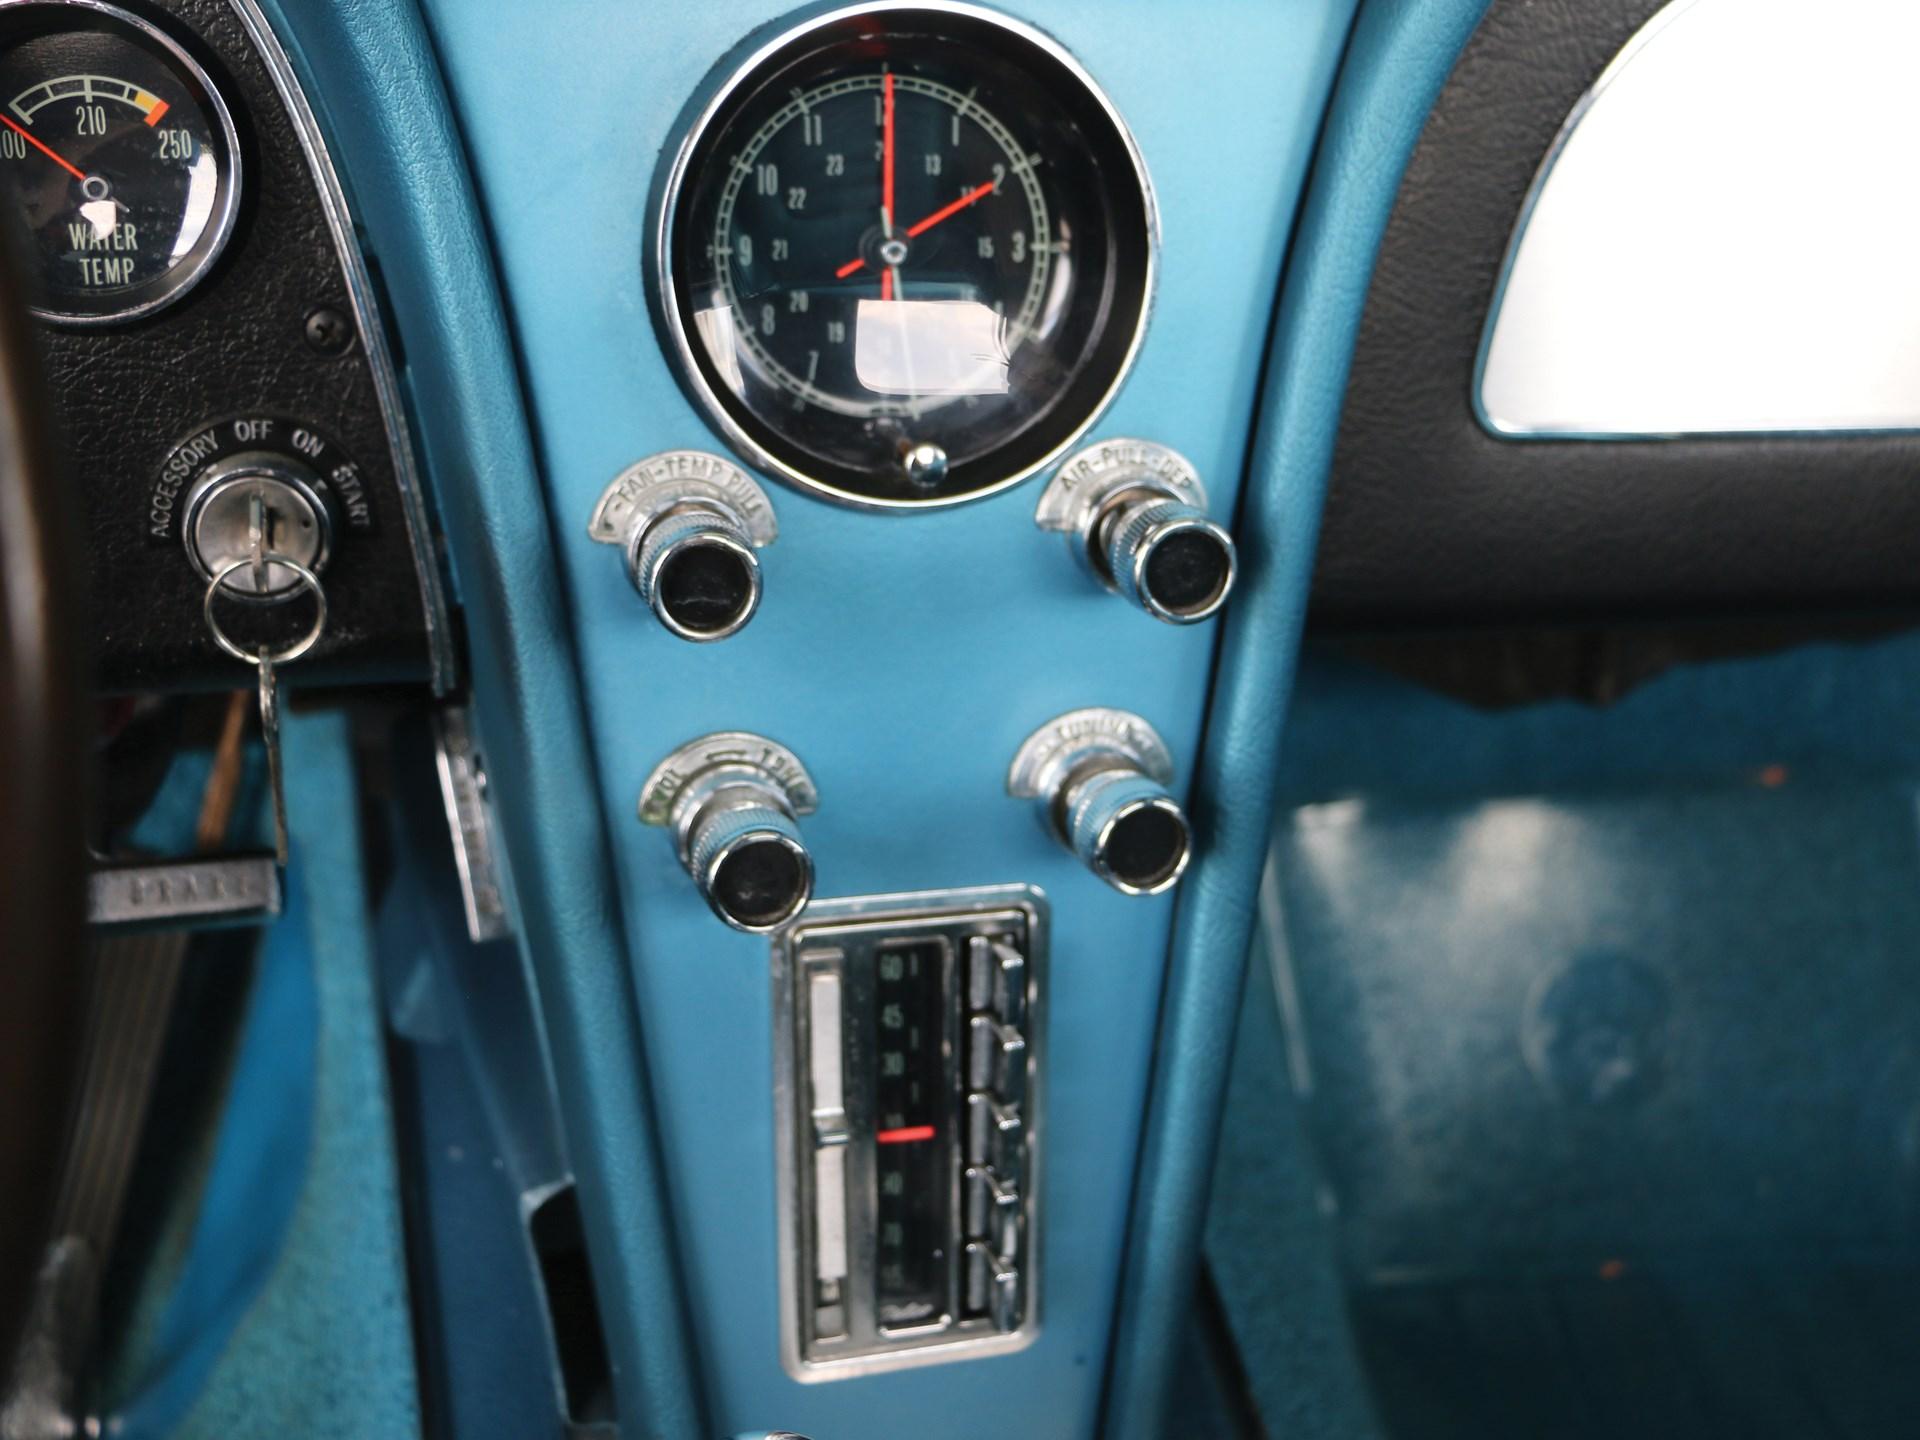 1966 Chevrolet Corvette Sting Ray 427/425 Convertible